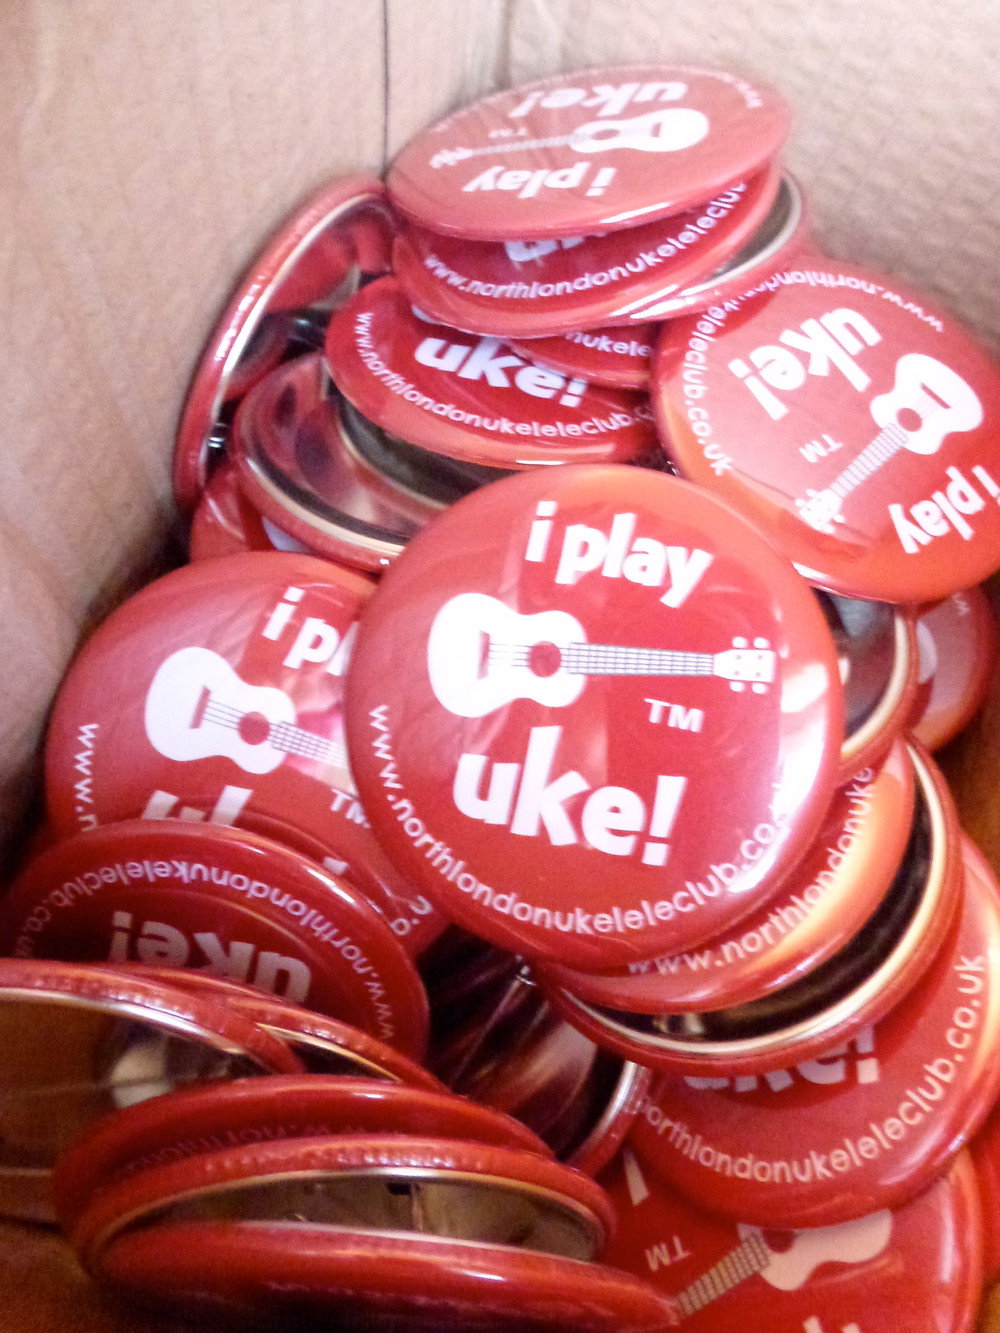 03 Badges in box.JPG